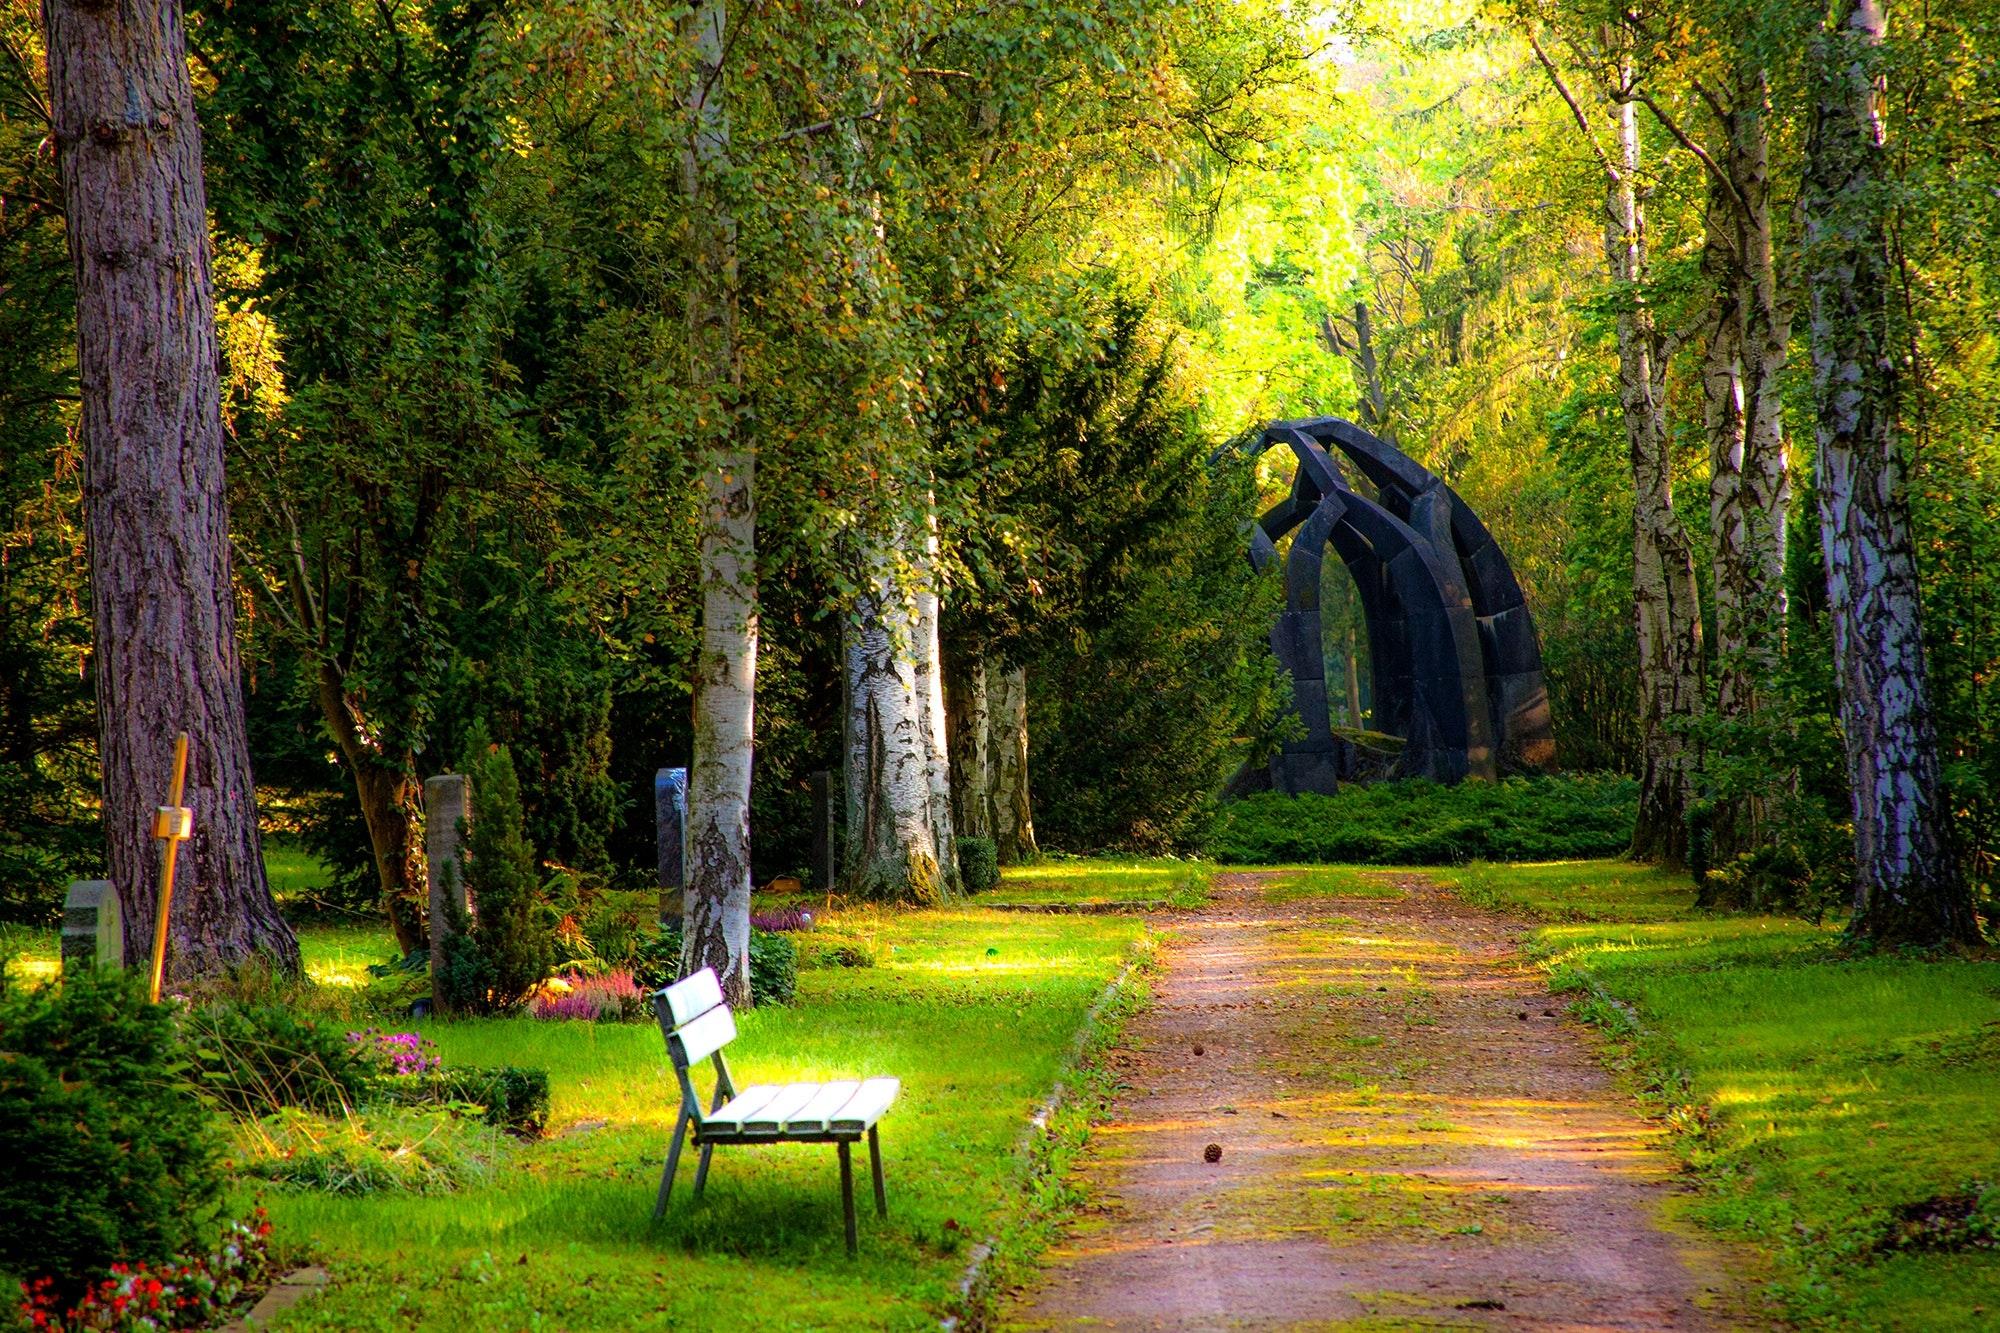 Gentil 1000+ Interesting Garden Photos · Pexels · Free Stock Photos